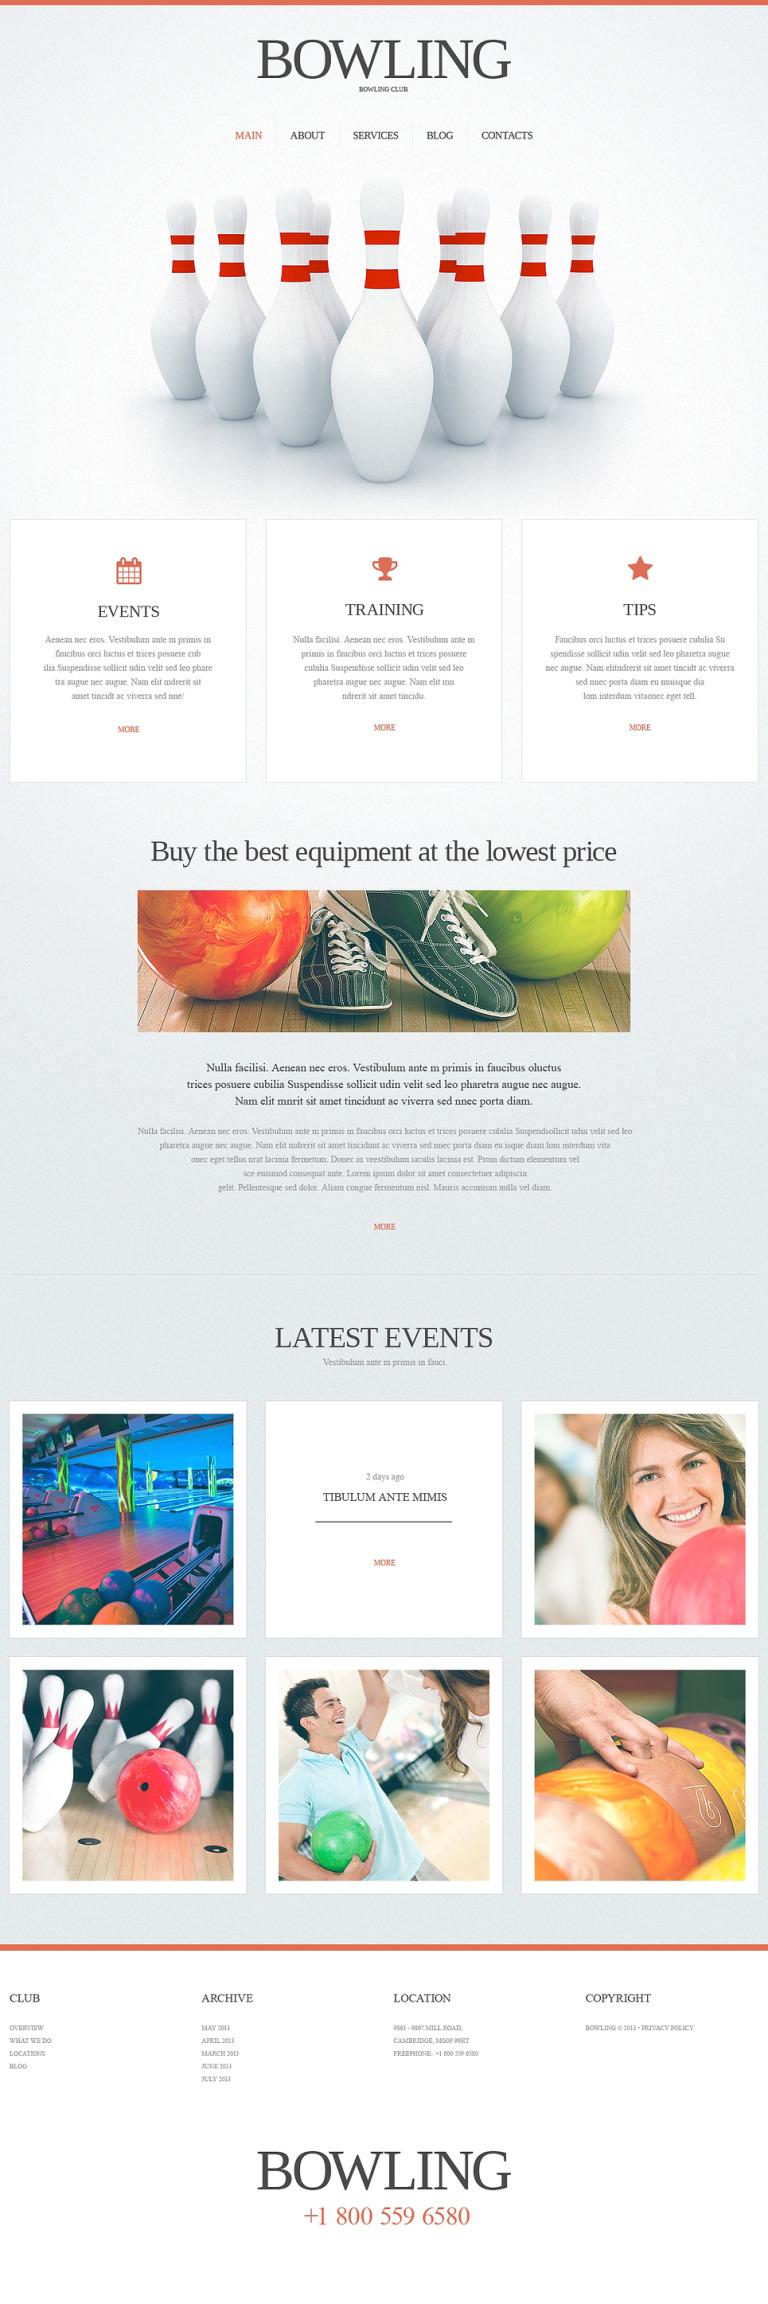 Bowling Responsive Website Template New Screenshots BIG